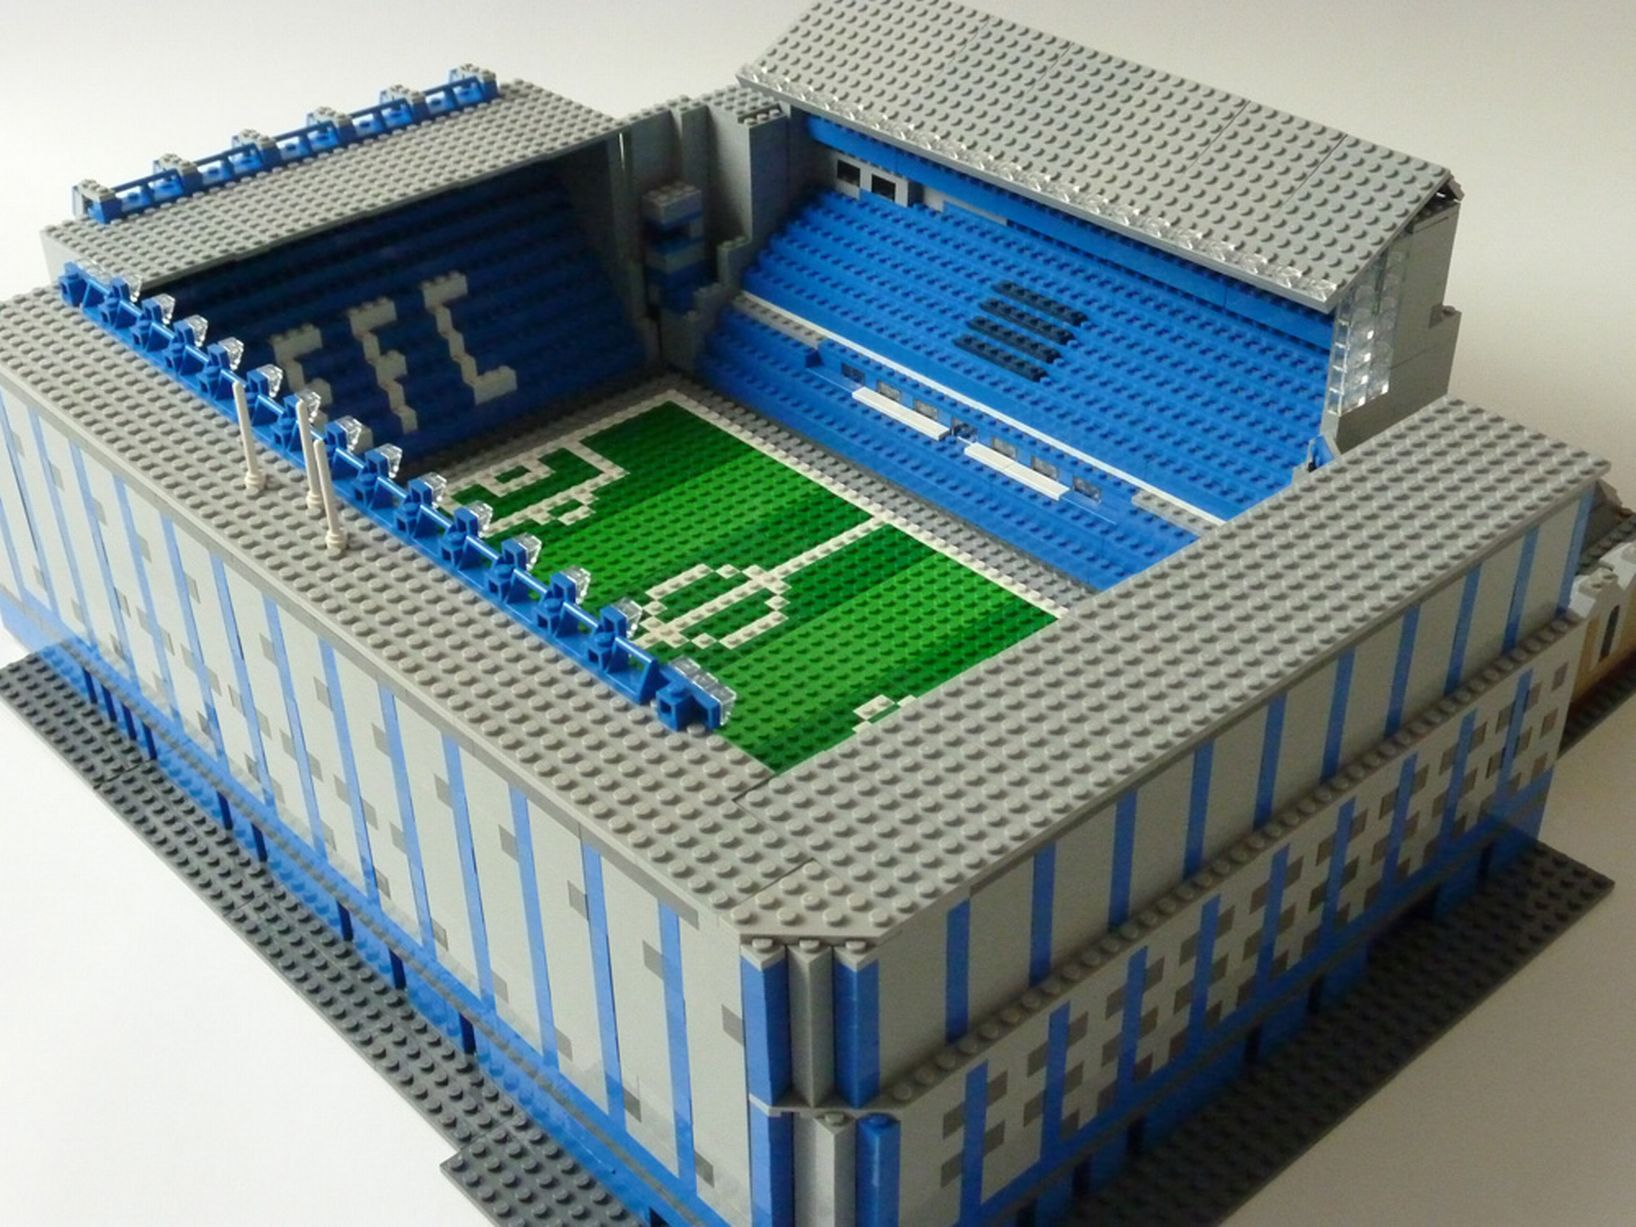 See amazing Lego versions of Anfield, Highbury, Goodison